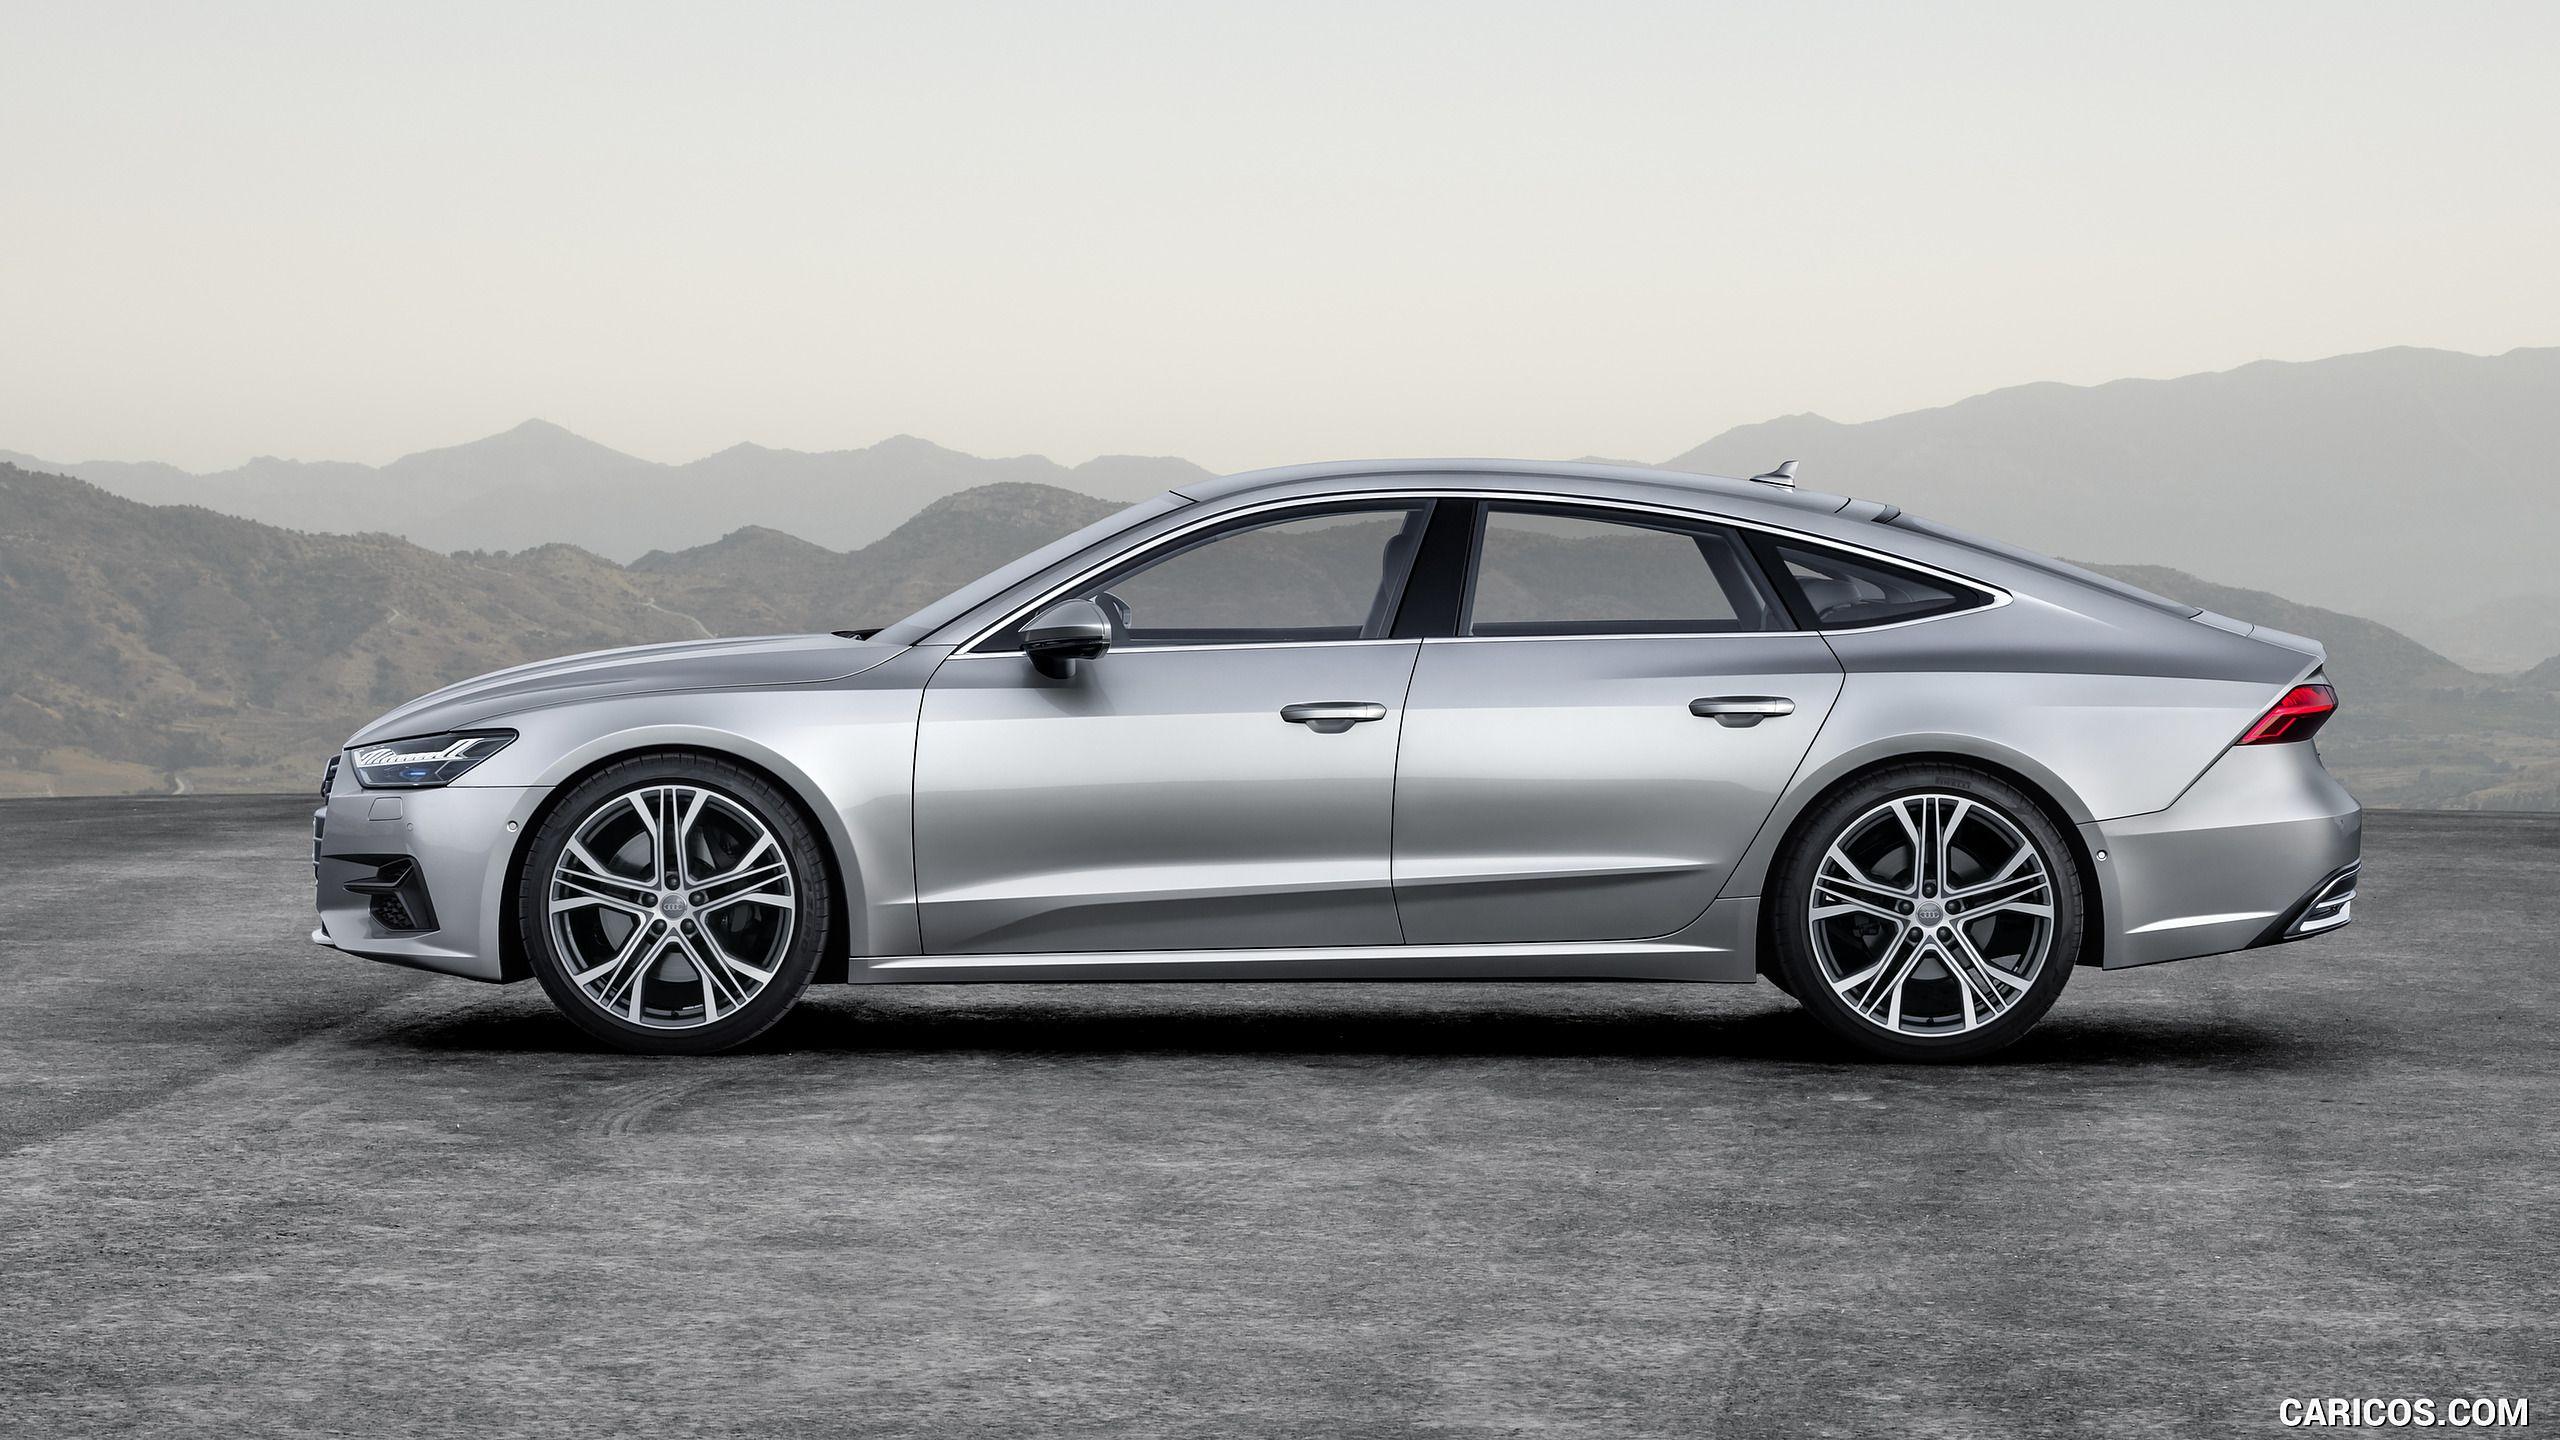 2019 Audi A7 Sportback Wallpaper Automotive Audi A7 Sportback